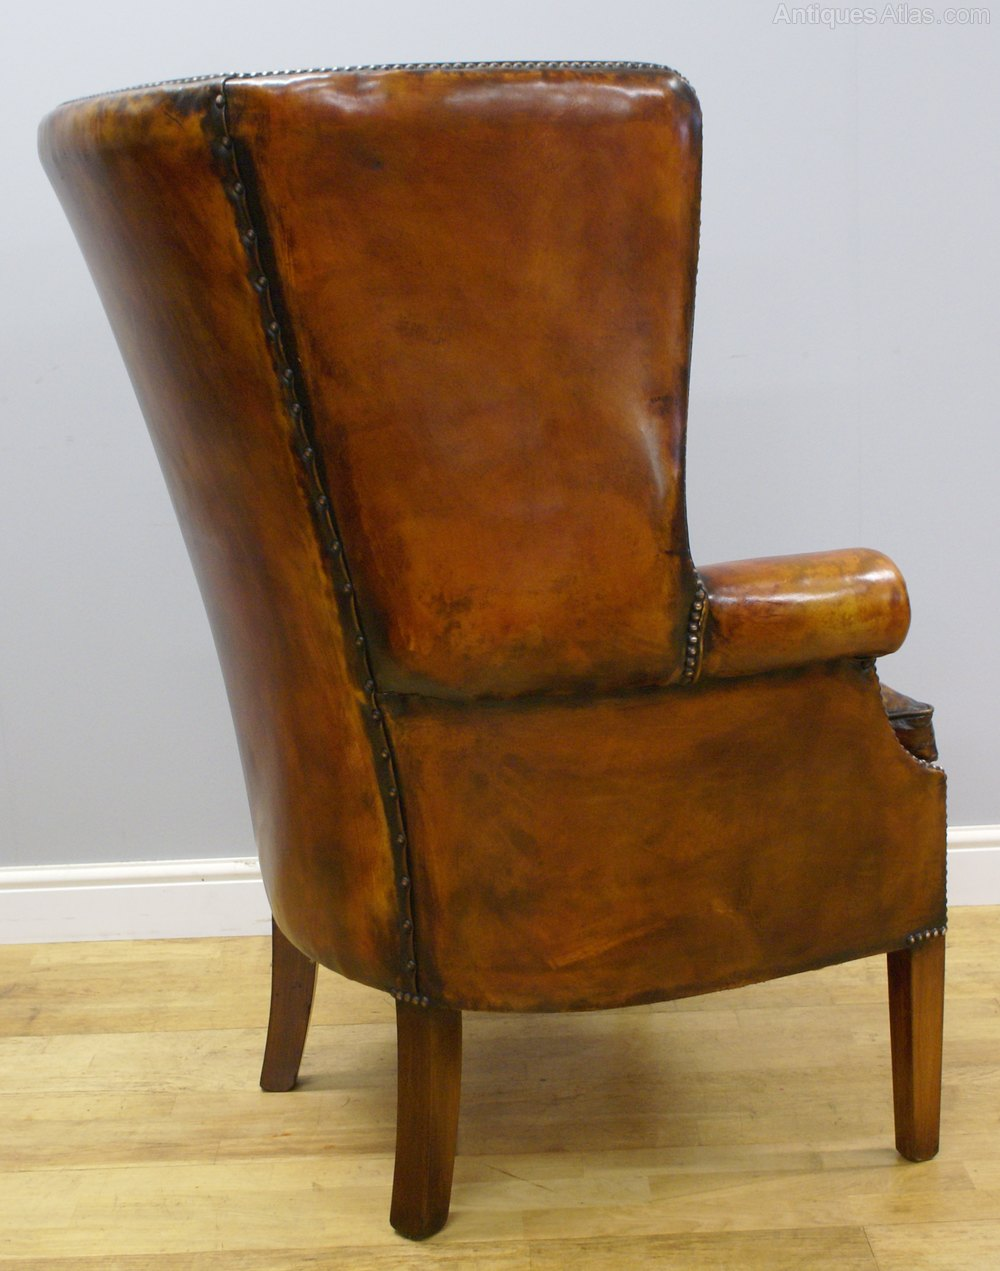 A Georgian Style Barrel Back Wing Chair Antiques Atlas